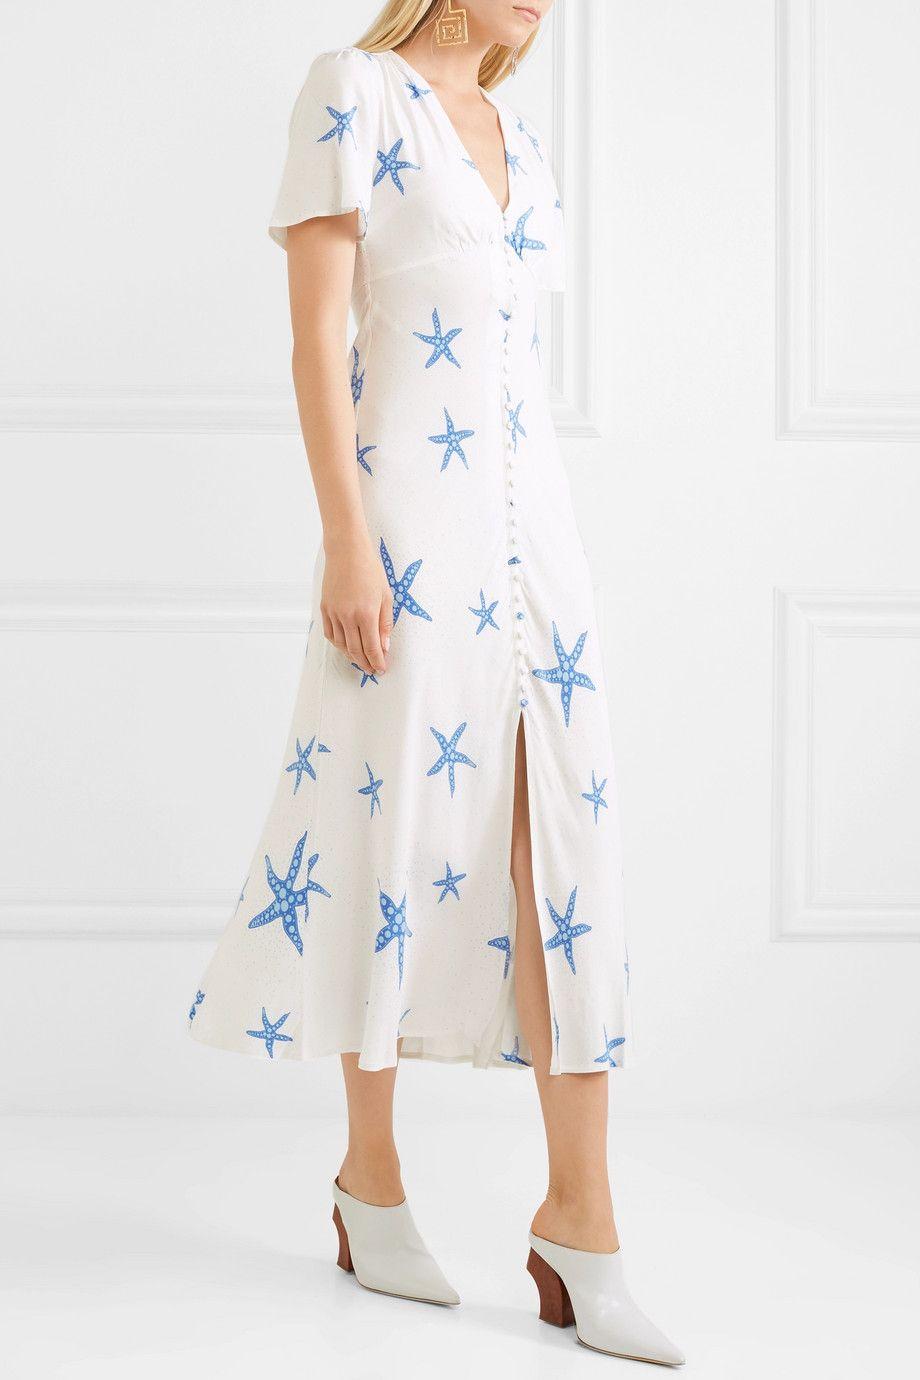 21+ Badgley mischka blue neutral stripe dress trends